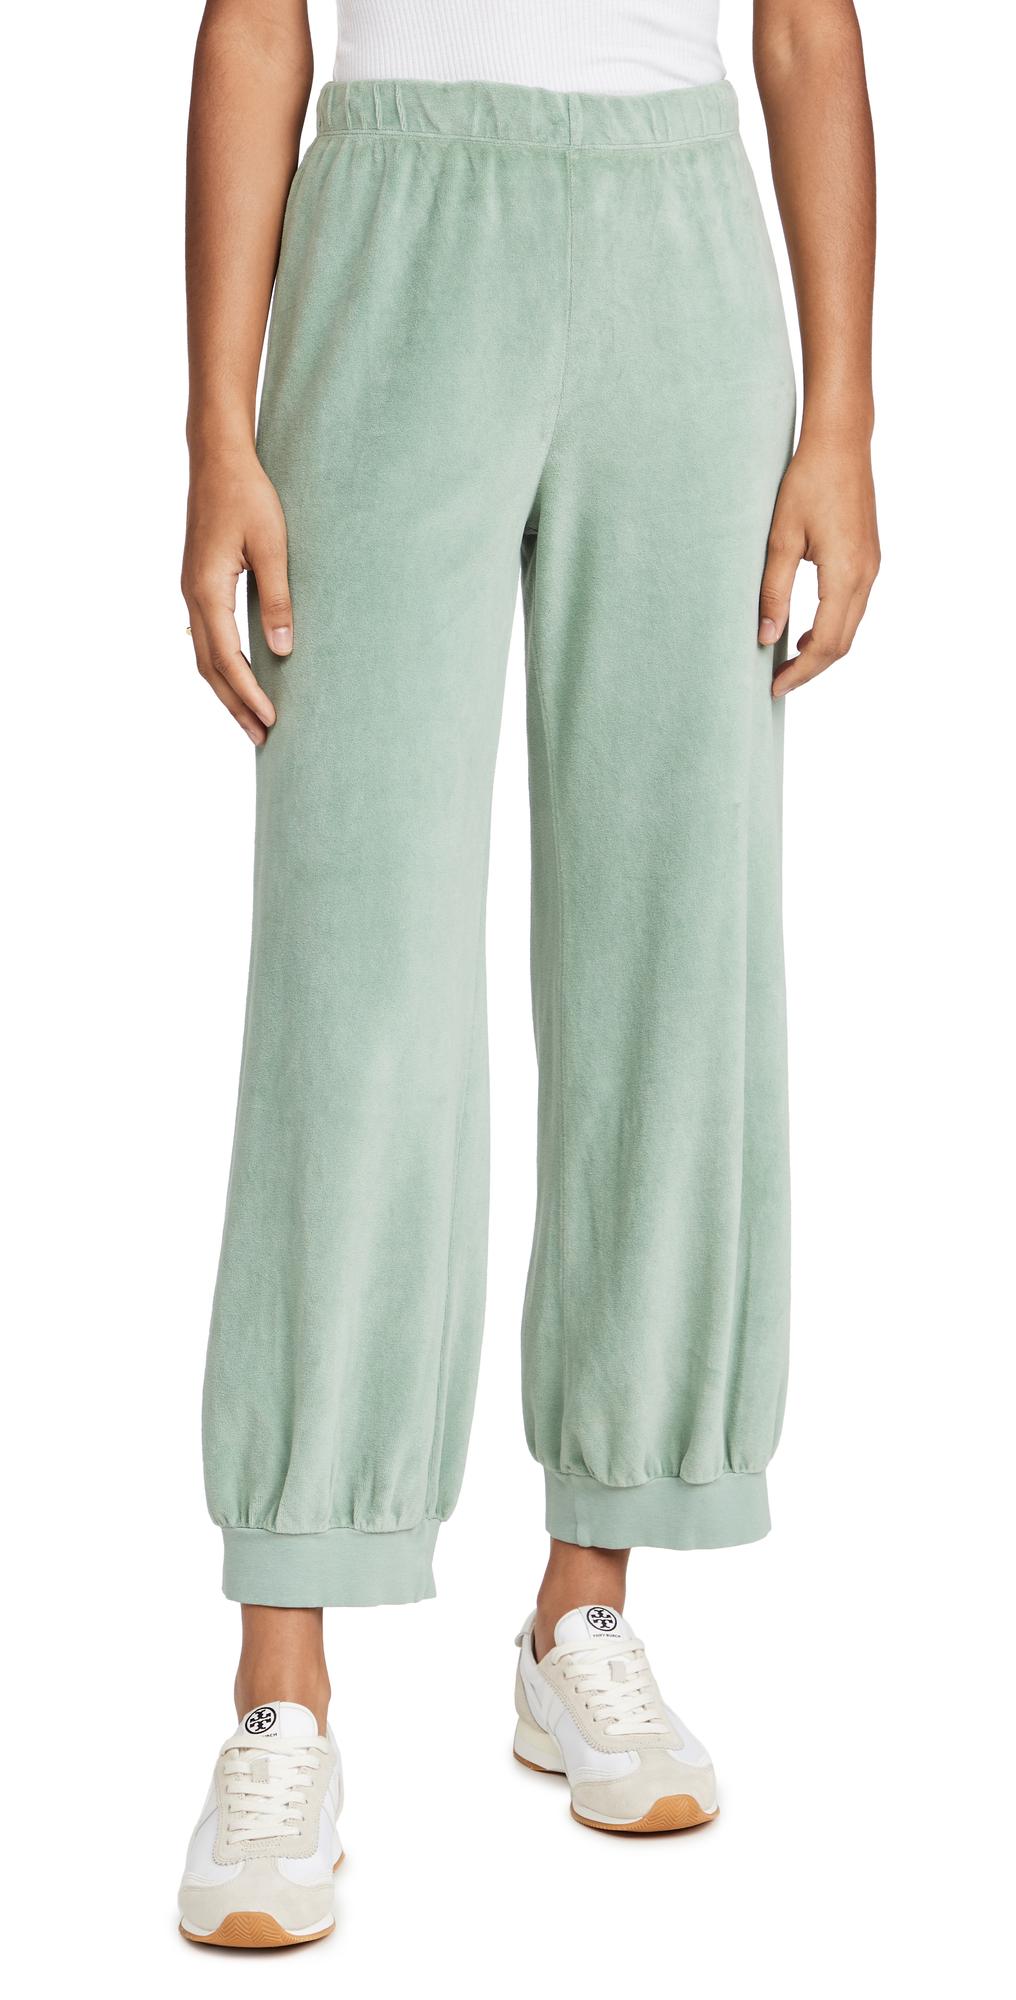 High Waist Velour Pants